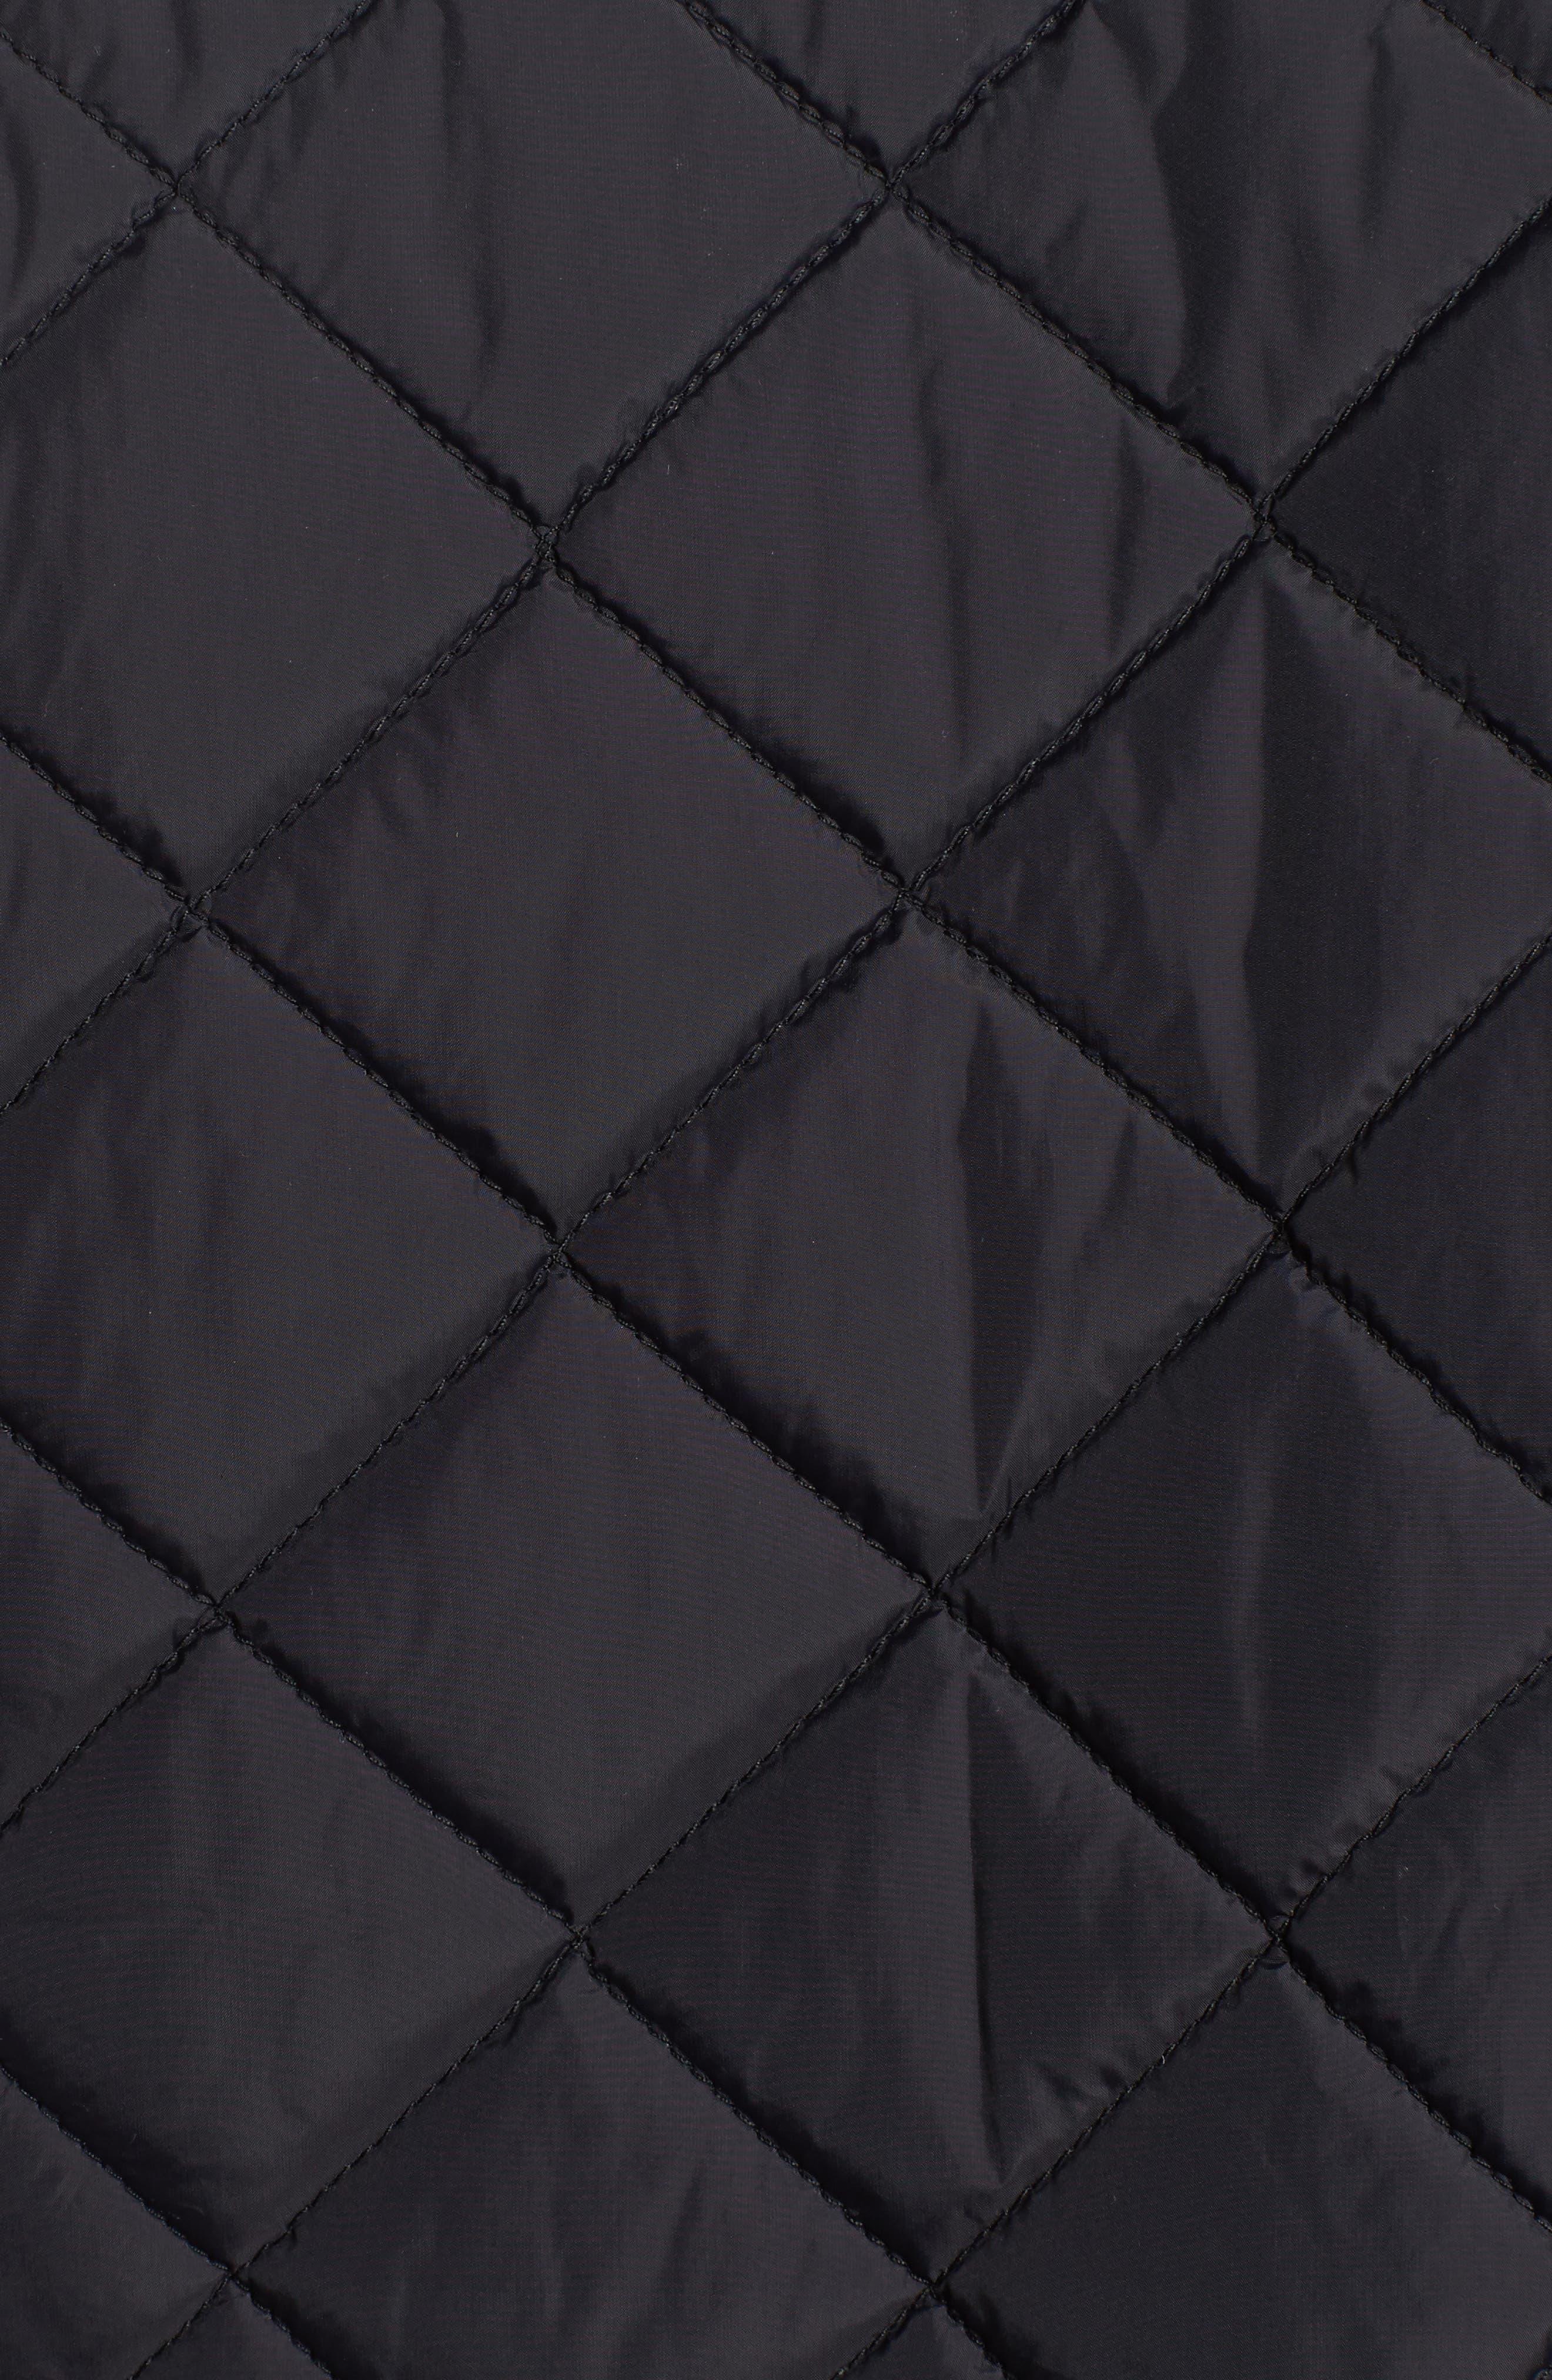 Diamond Quilted Full Zip Jacket,                             Alternate thumbnail 6, color,                             Black